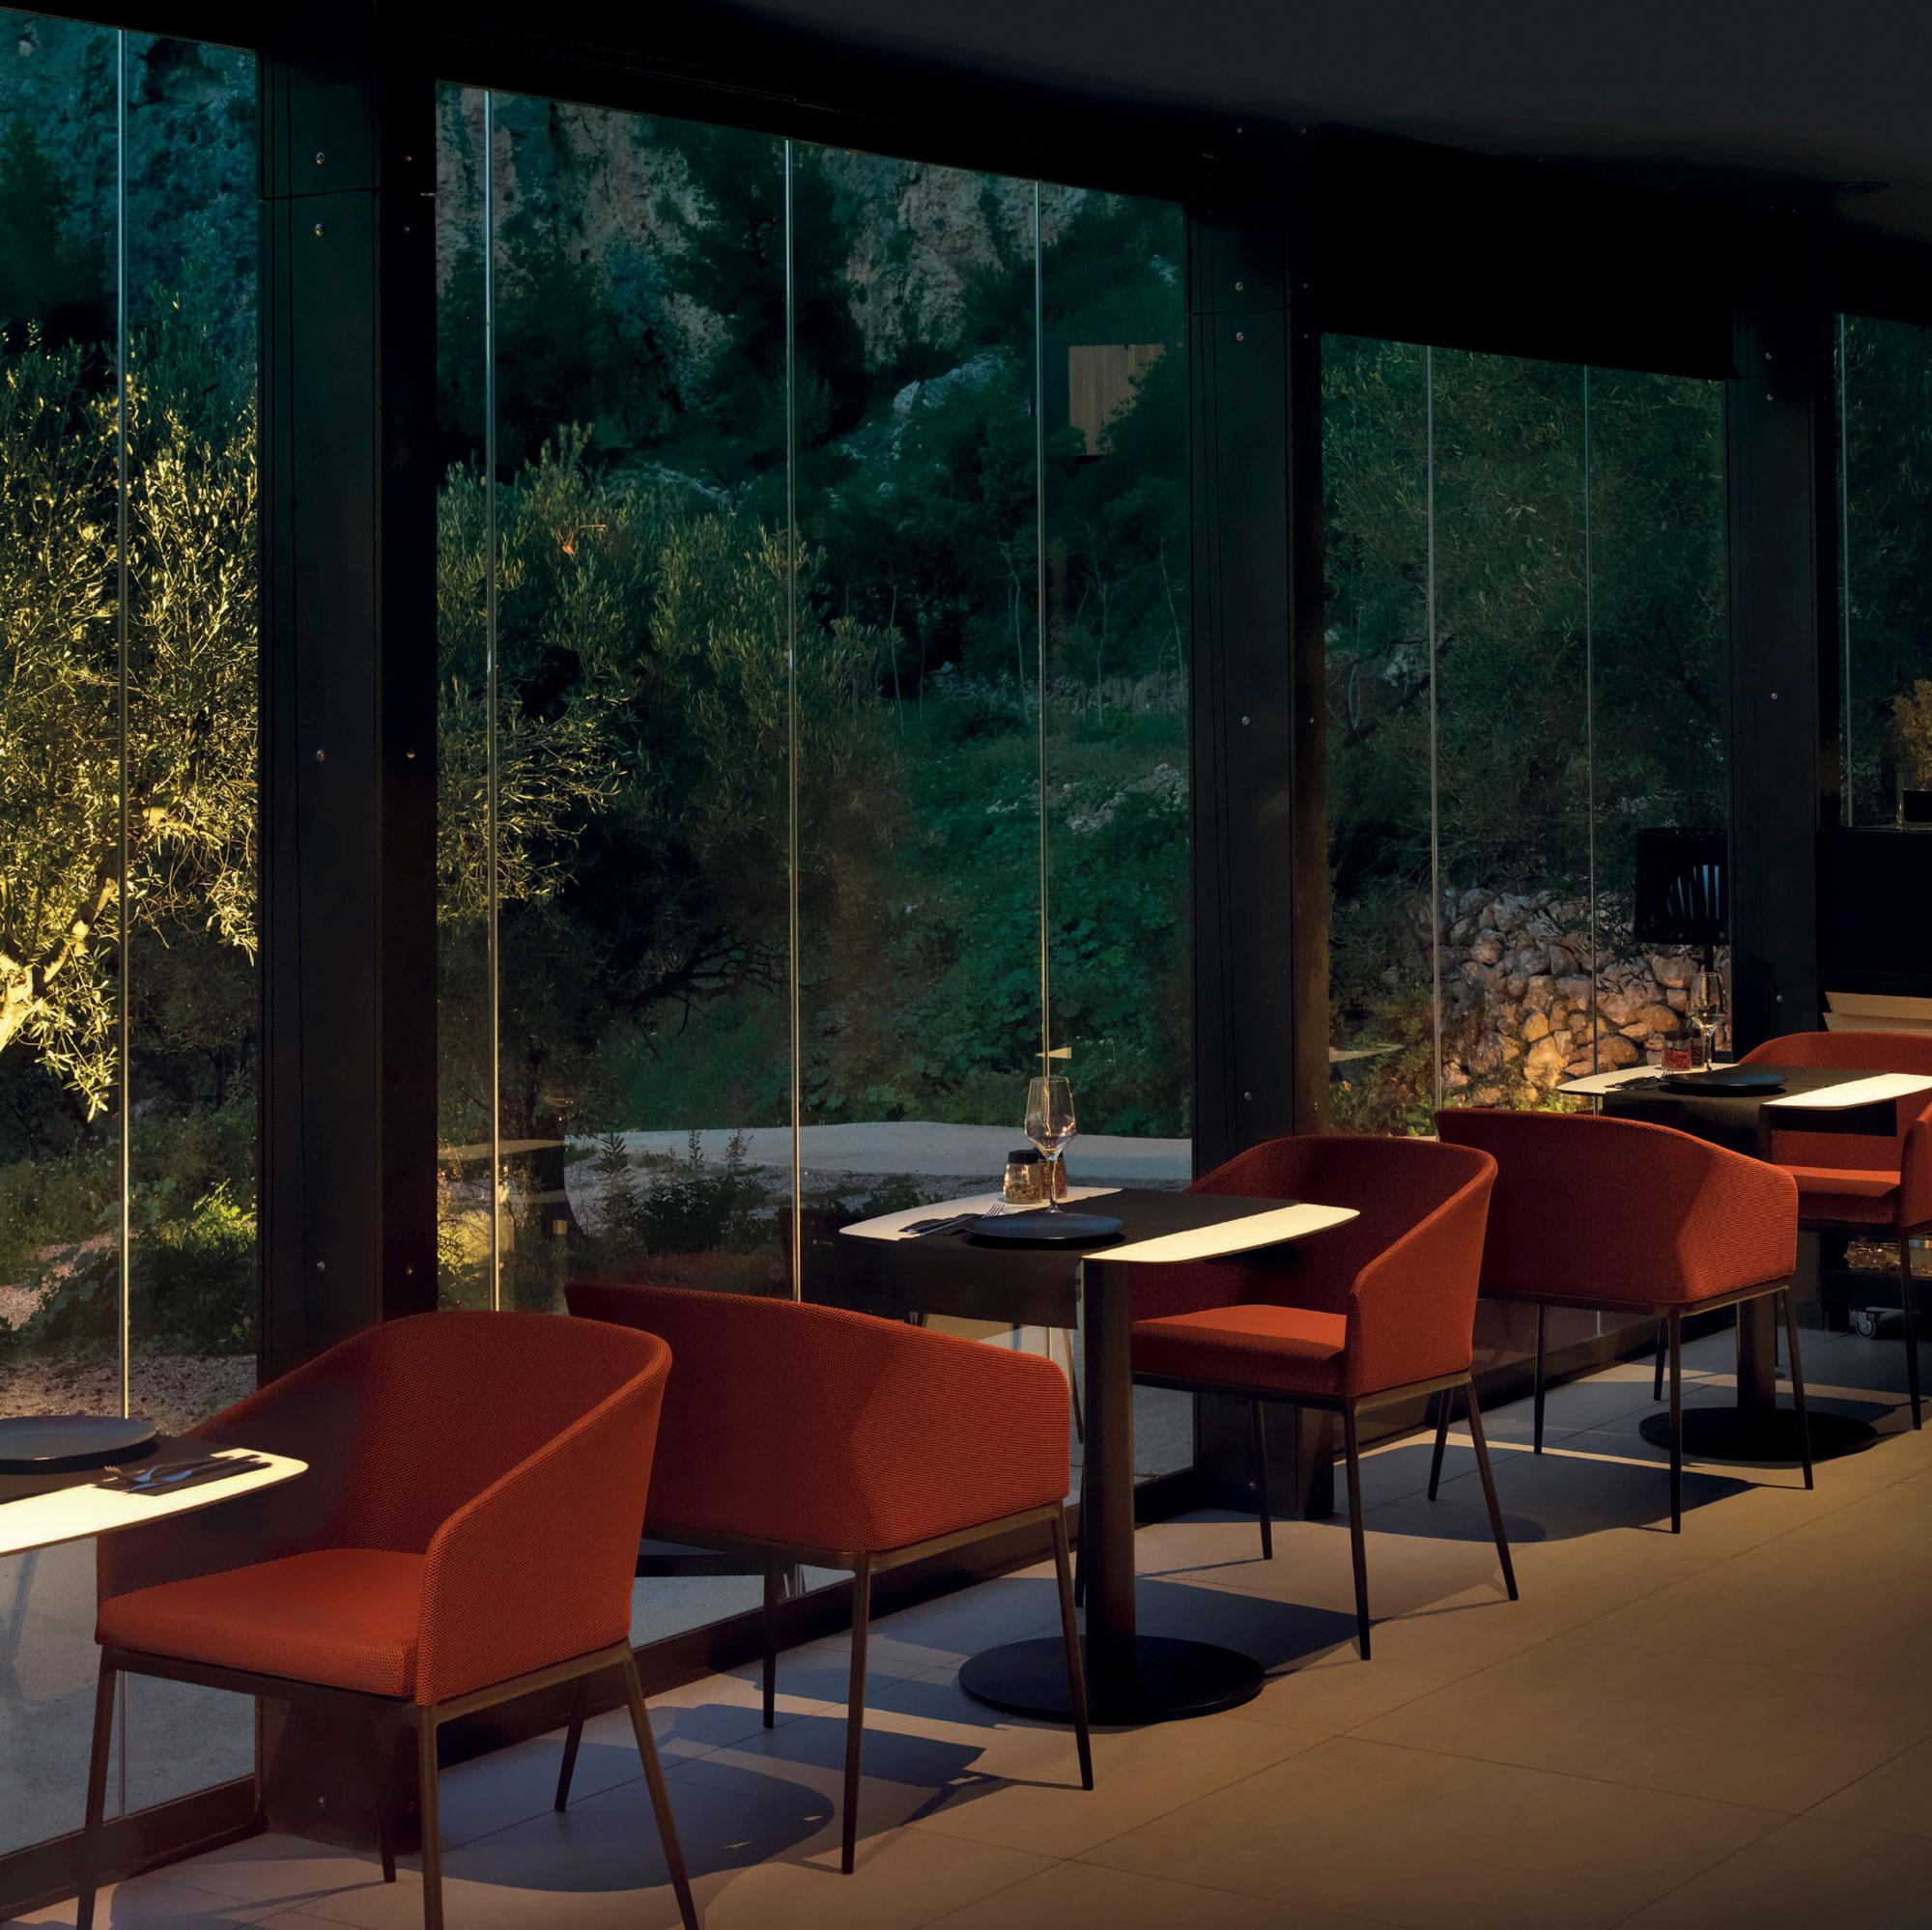 senso-chairs-armchair-studio-expormim-furniture-outdoor-04